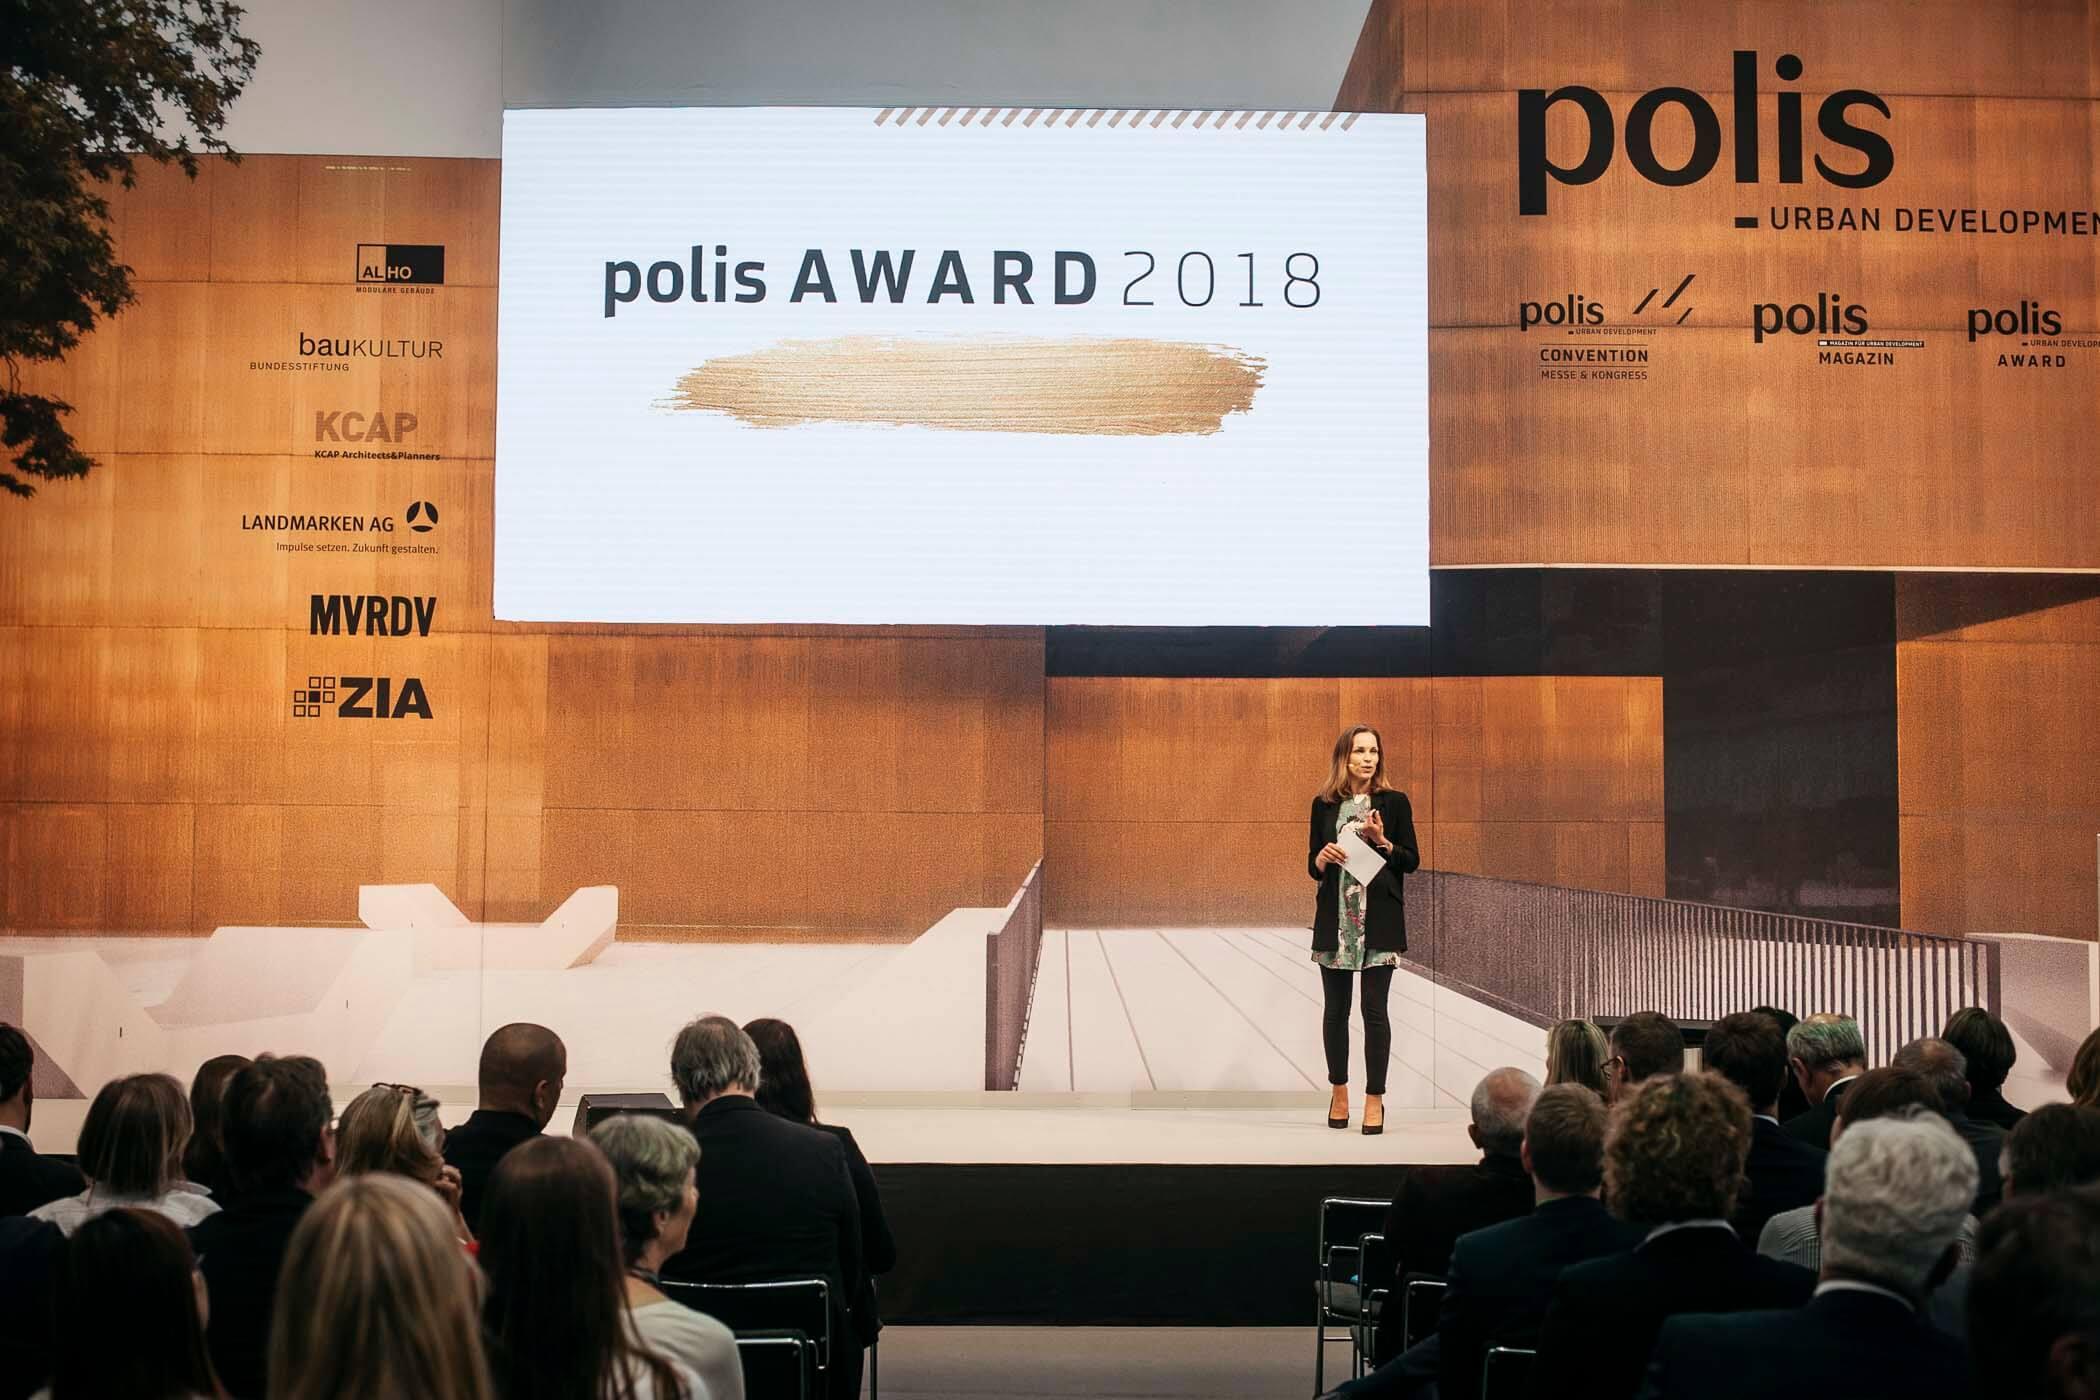 polis AWARD – Alexander Rühl